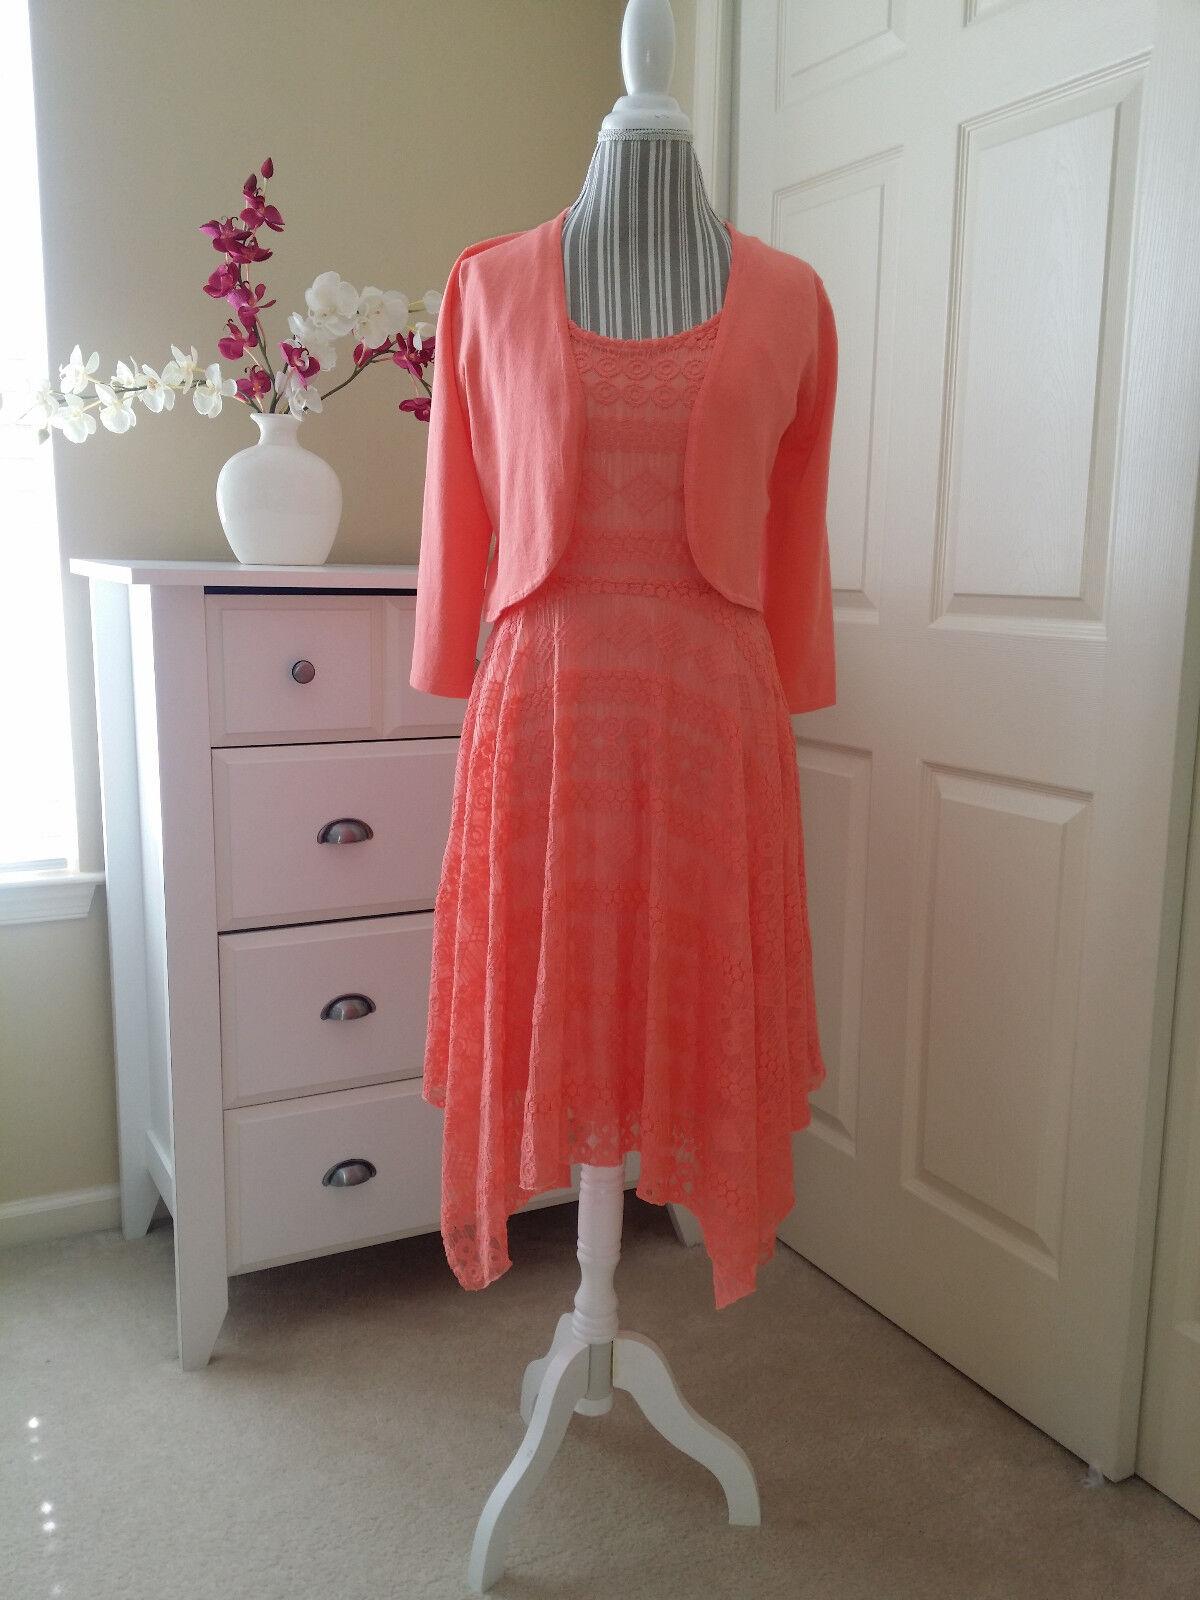 NWT CUPIO Coral Coral Coral bluesh Hanky Lace Ladies Dress with Knit Shrug Cardigan Sz.M  146 ba02a6